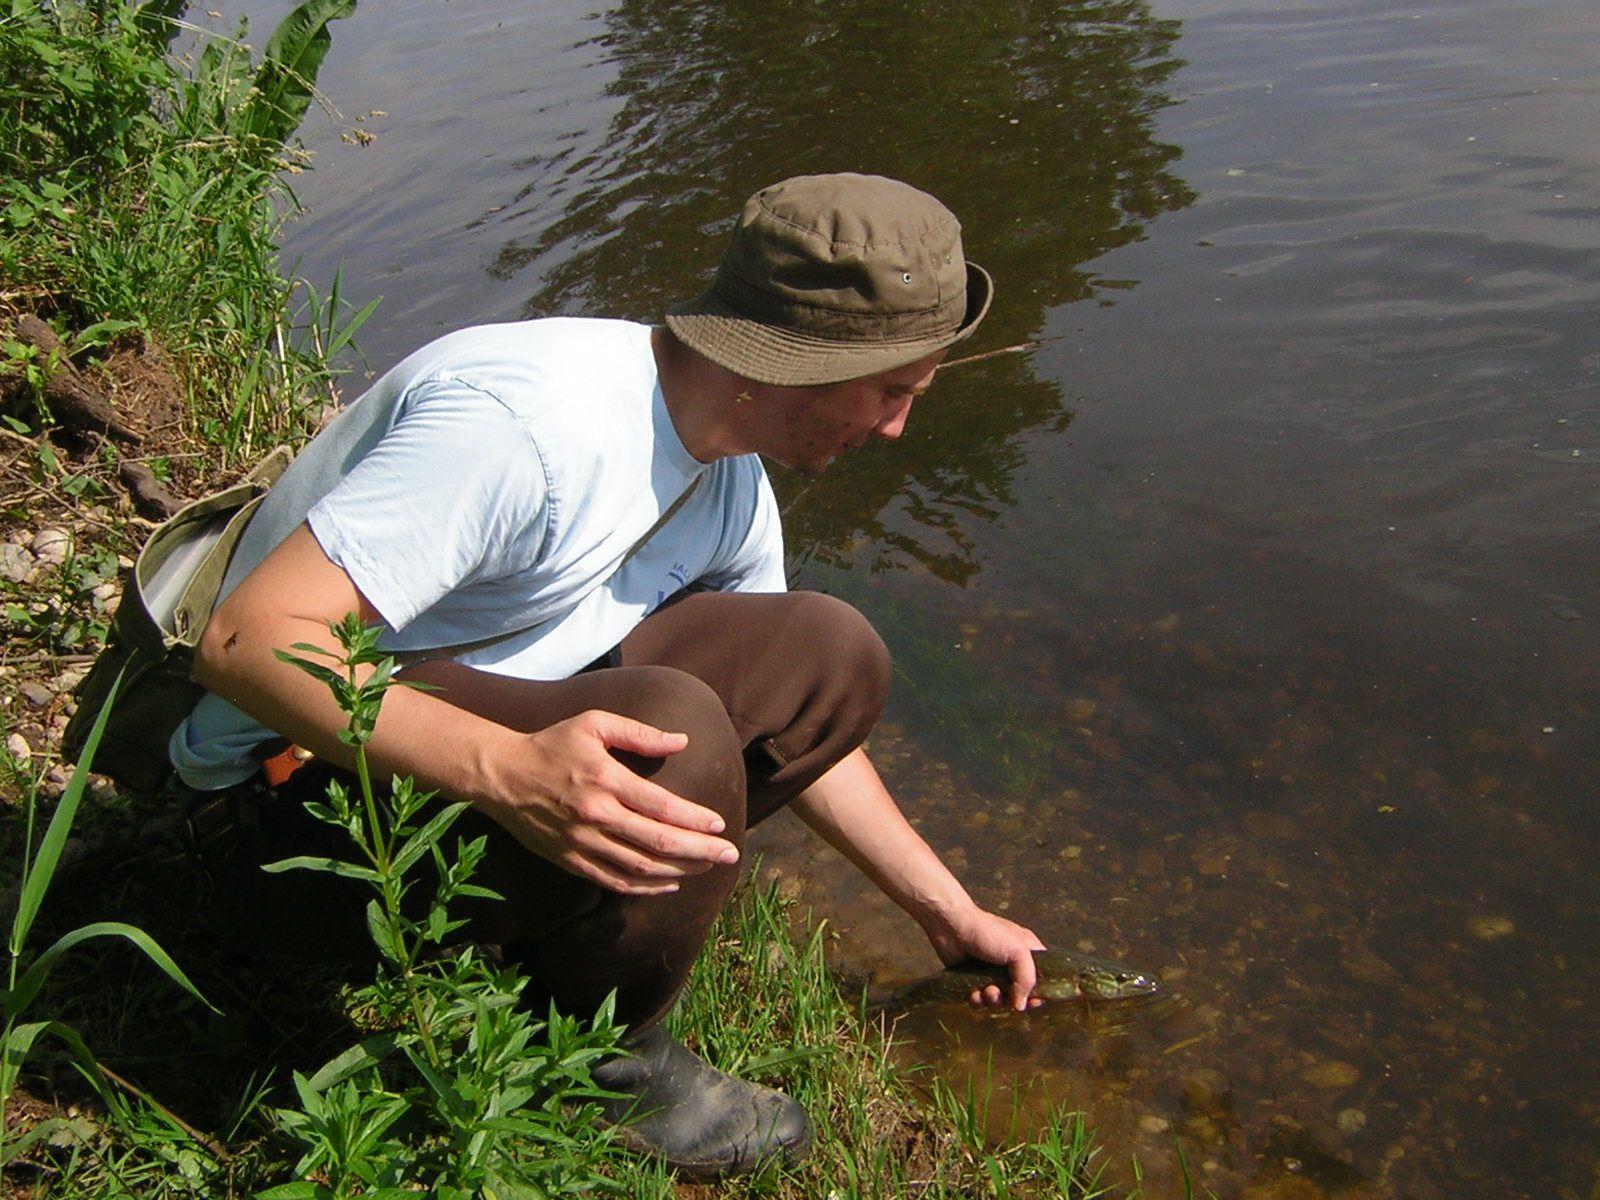 Sortie du pêche 20/06/2013 avec Gus (Lorraine-Meurthe)